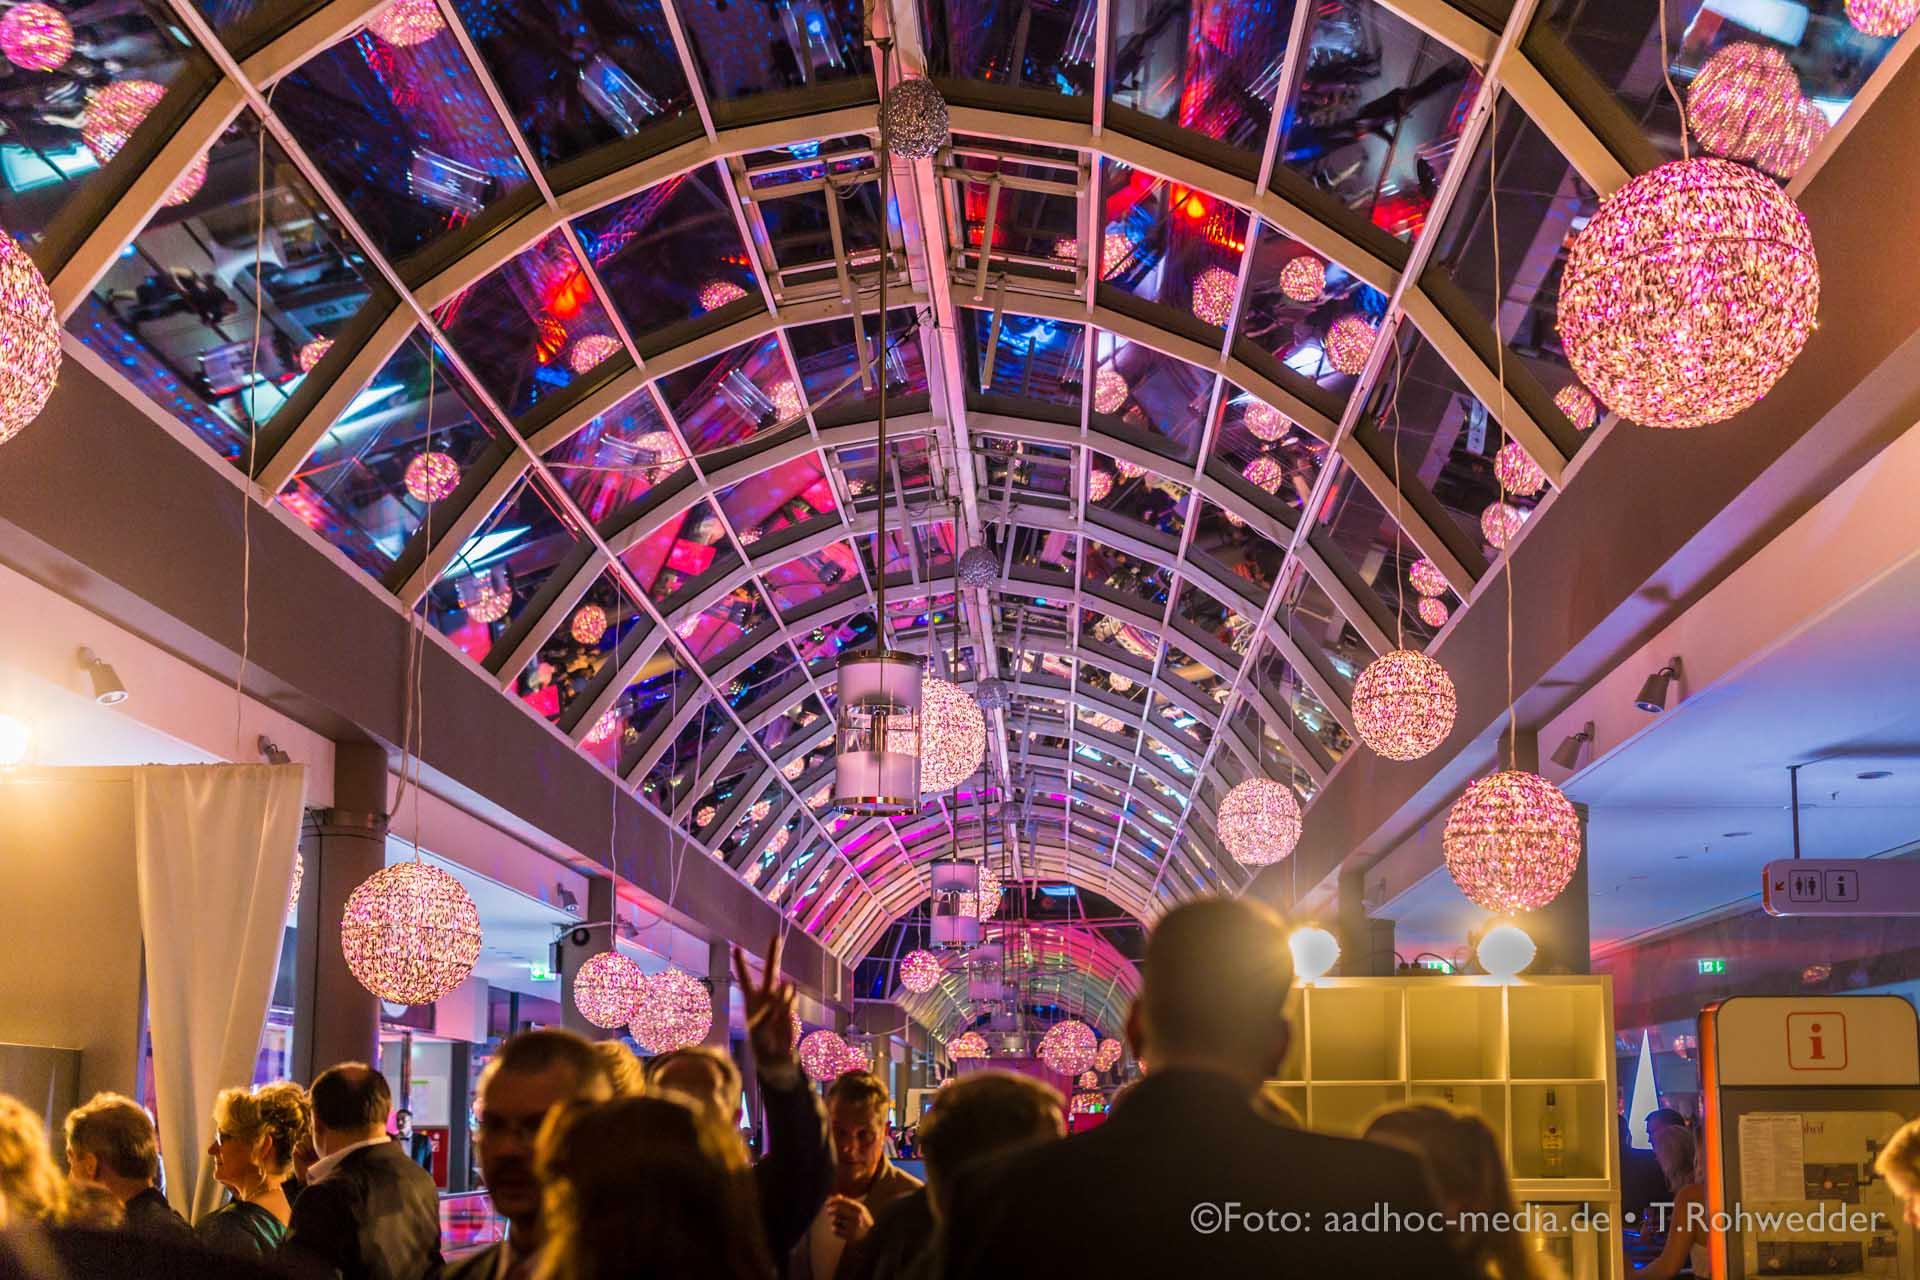 Kiels längste Nacht - Sophienhof - Kiel • © Foto: aadhoc-media • Thomas Rohwedder • Momentalist • Hochzeitsfotograf